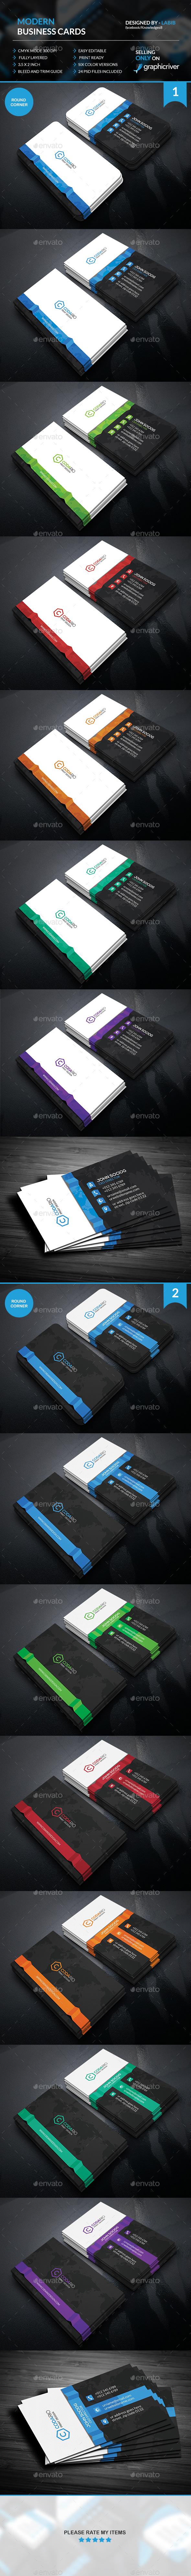 Modern Creative Business Cards - Creative Business Cards